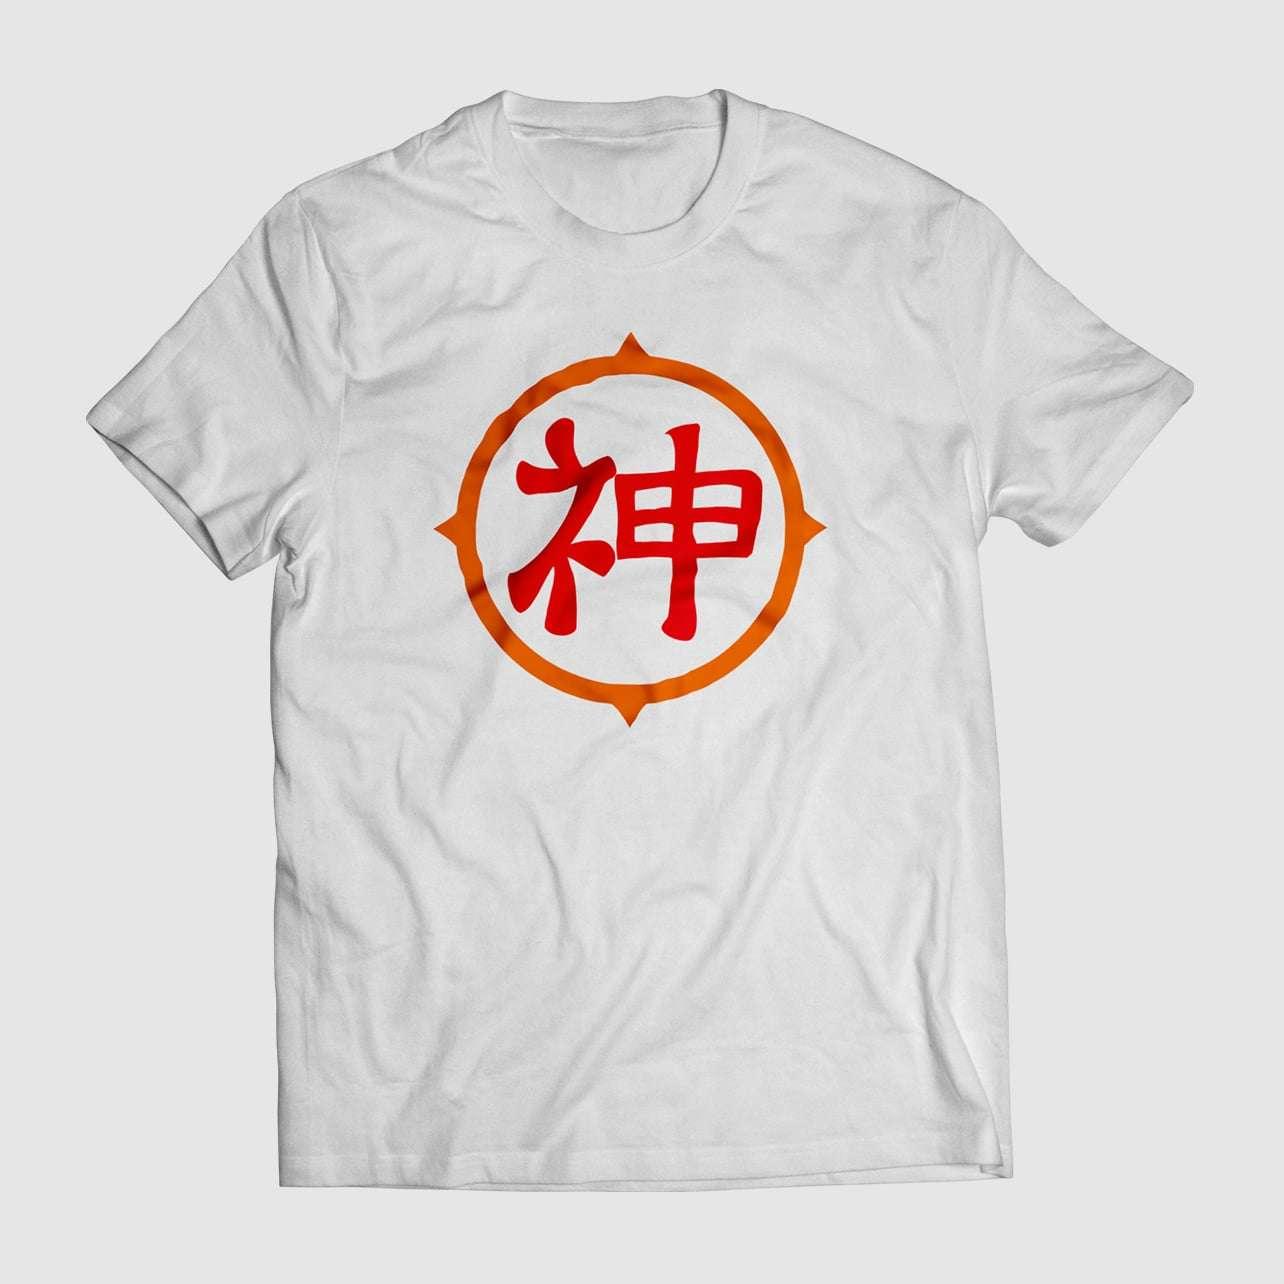 T-Shirt - Kami Symbol apparel